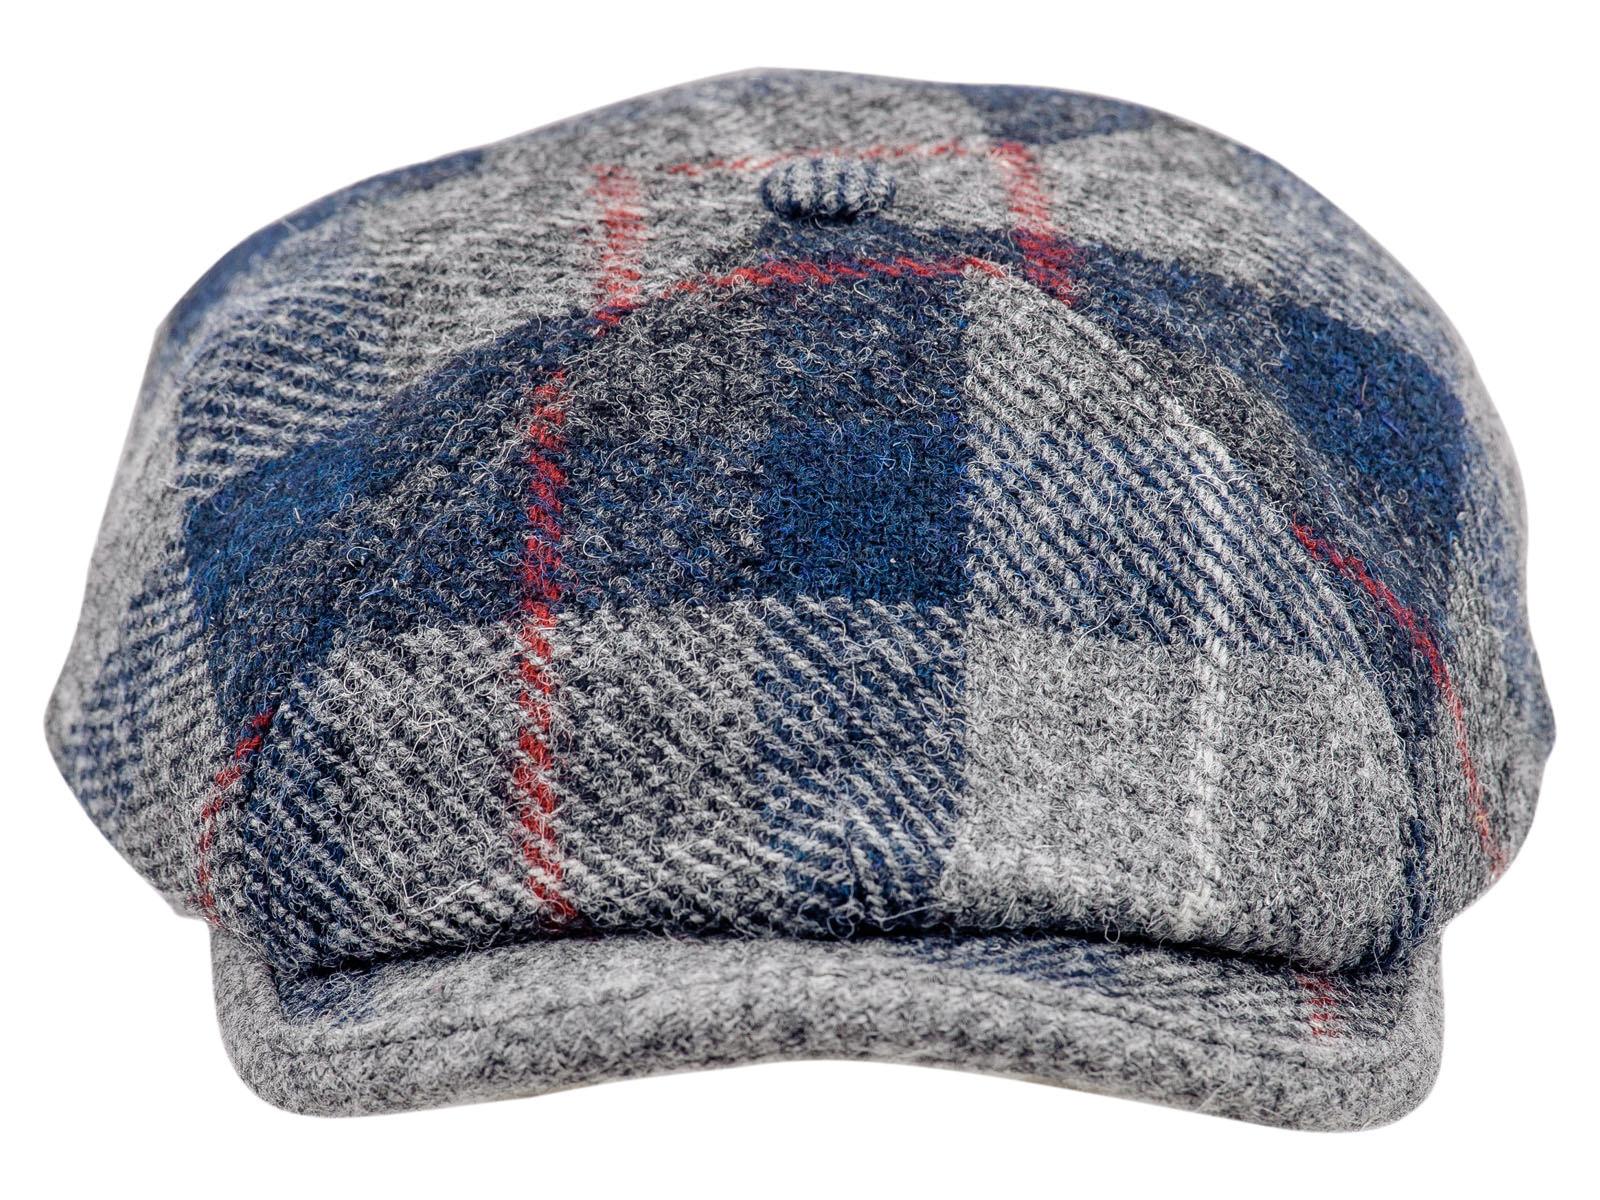 28a293bf7ee Docker longshoreman beanie Leon cap made of 100% pure emerizing cotton